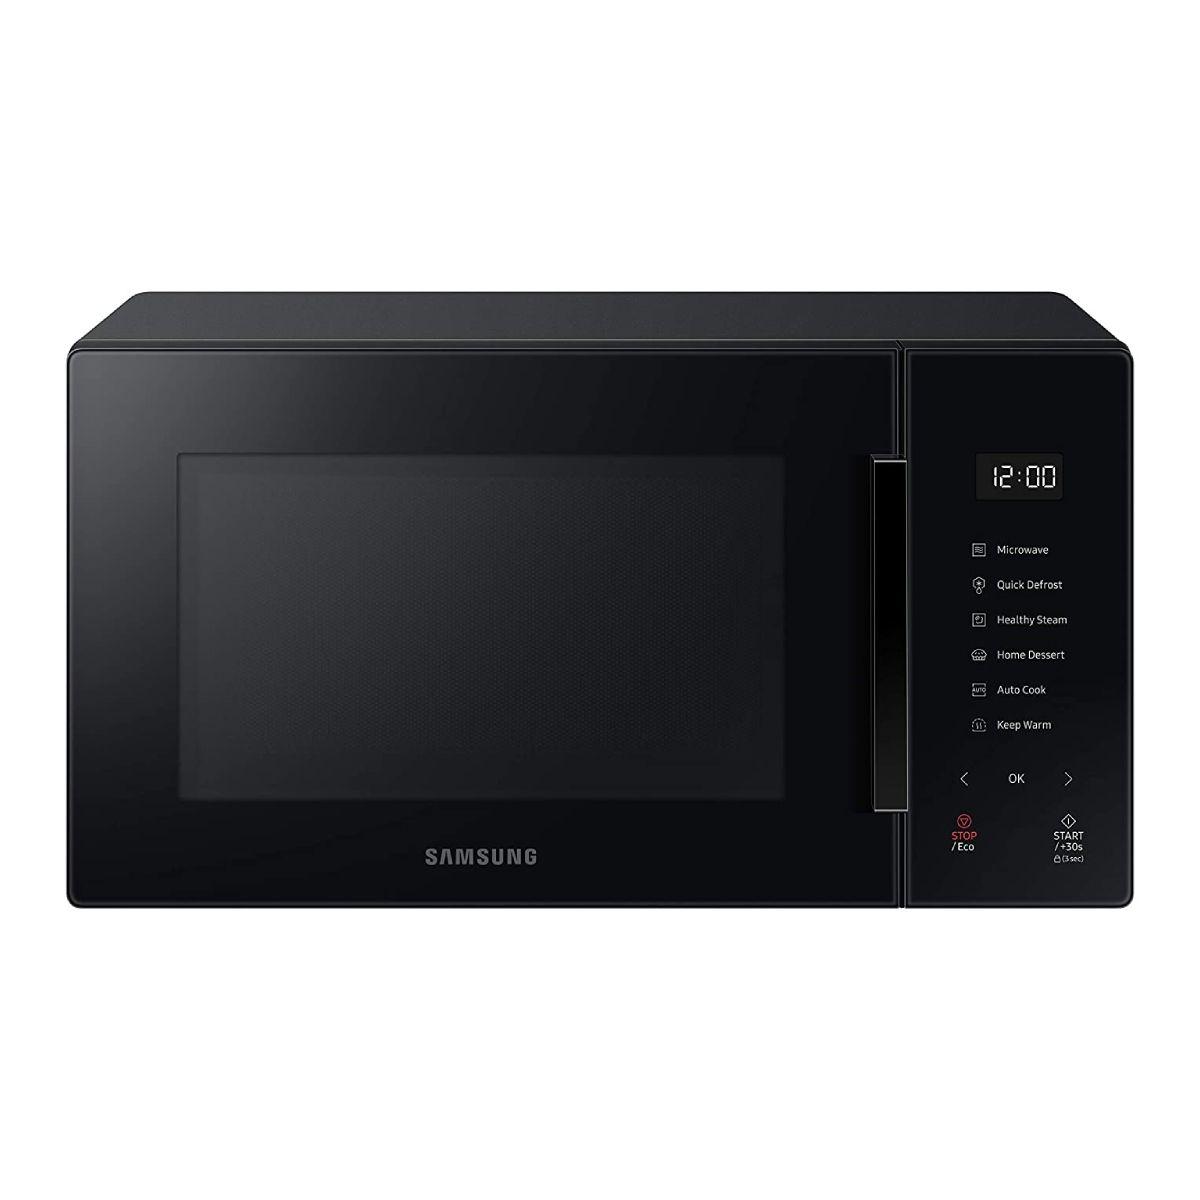 SAMSUNG 23 L Baker Series Microwave Oven (MS23T5012UK)